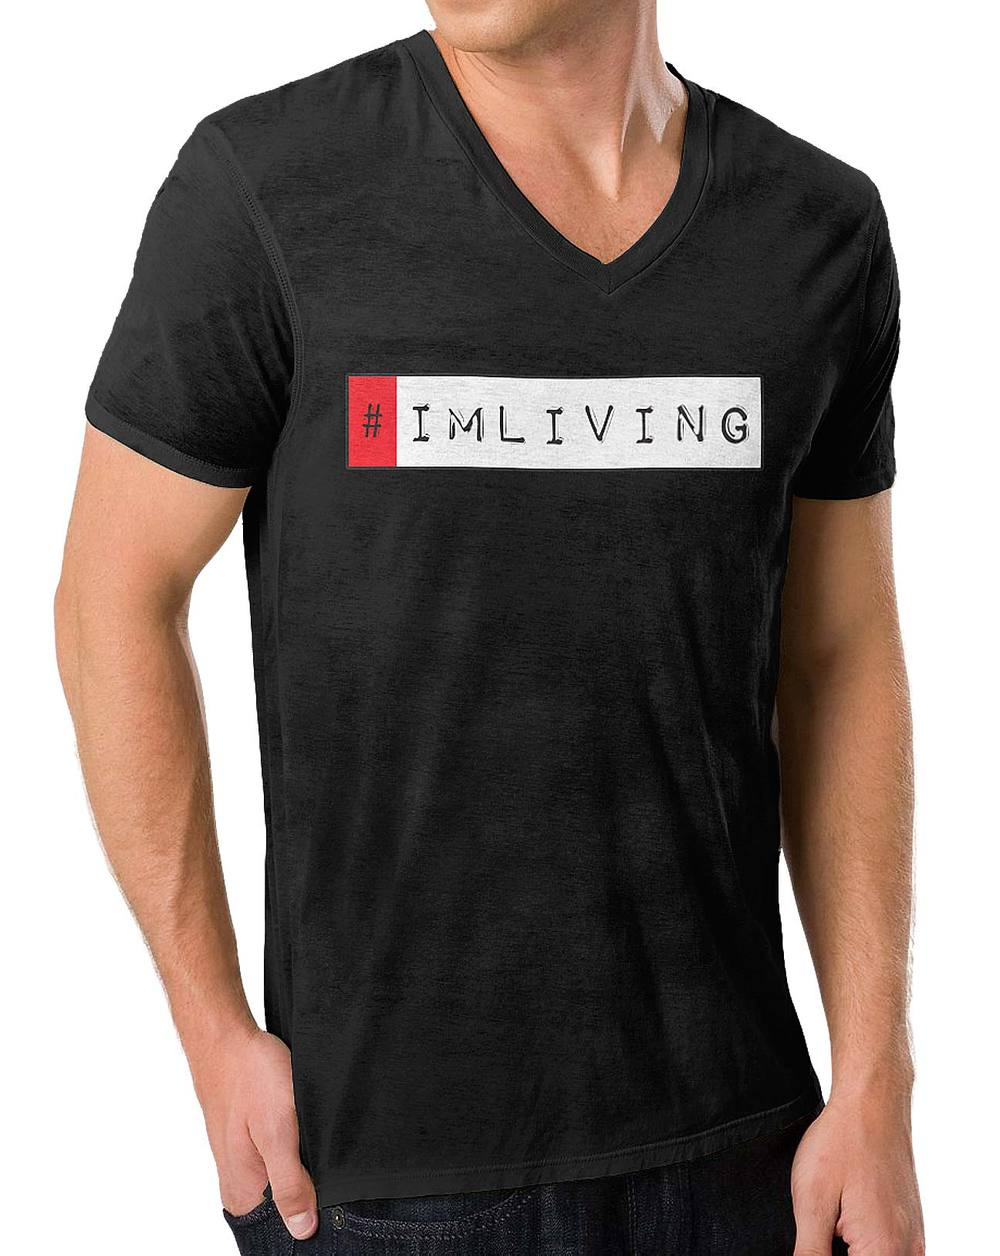 IMLIVING-MALE-SHIRT-BLACK.jpg